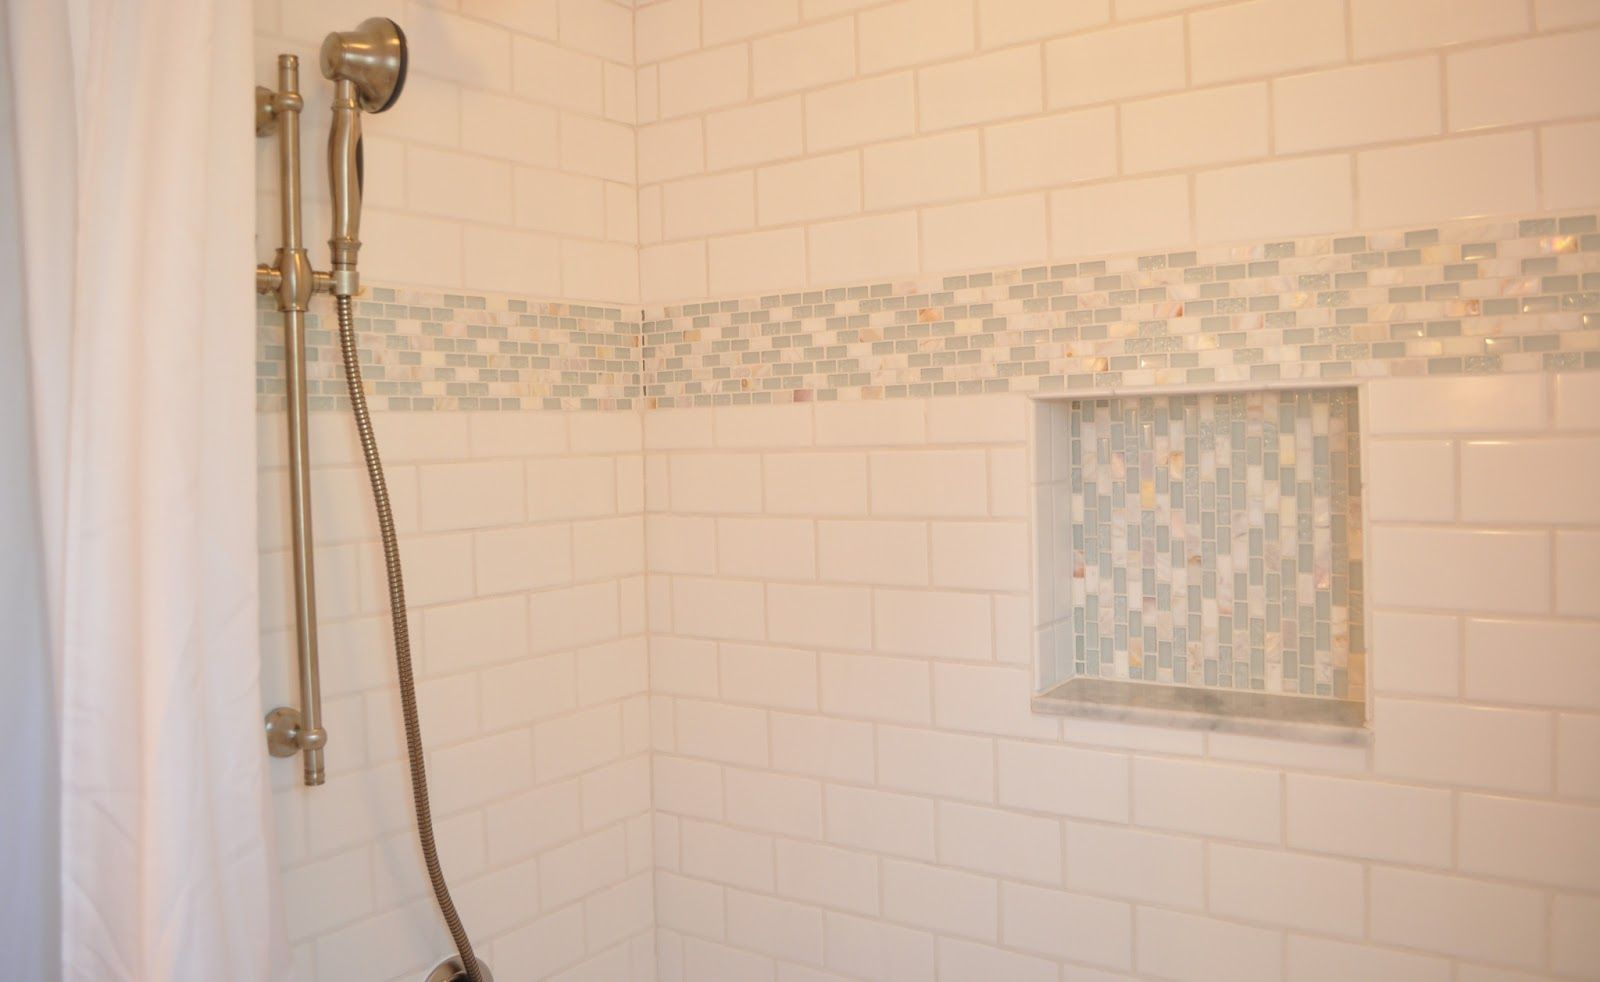 Tile Decoration White Mosaic Subway Backsplash · Impressive Room Interior Wall